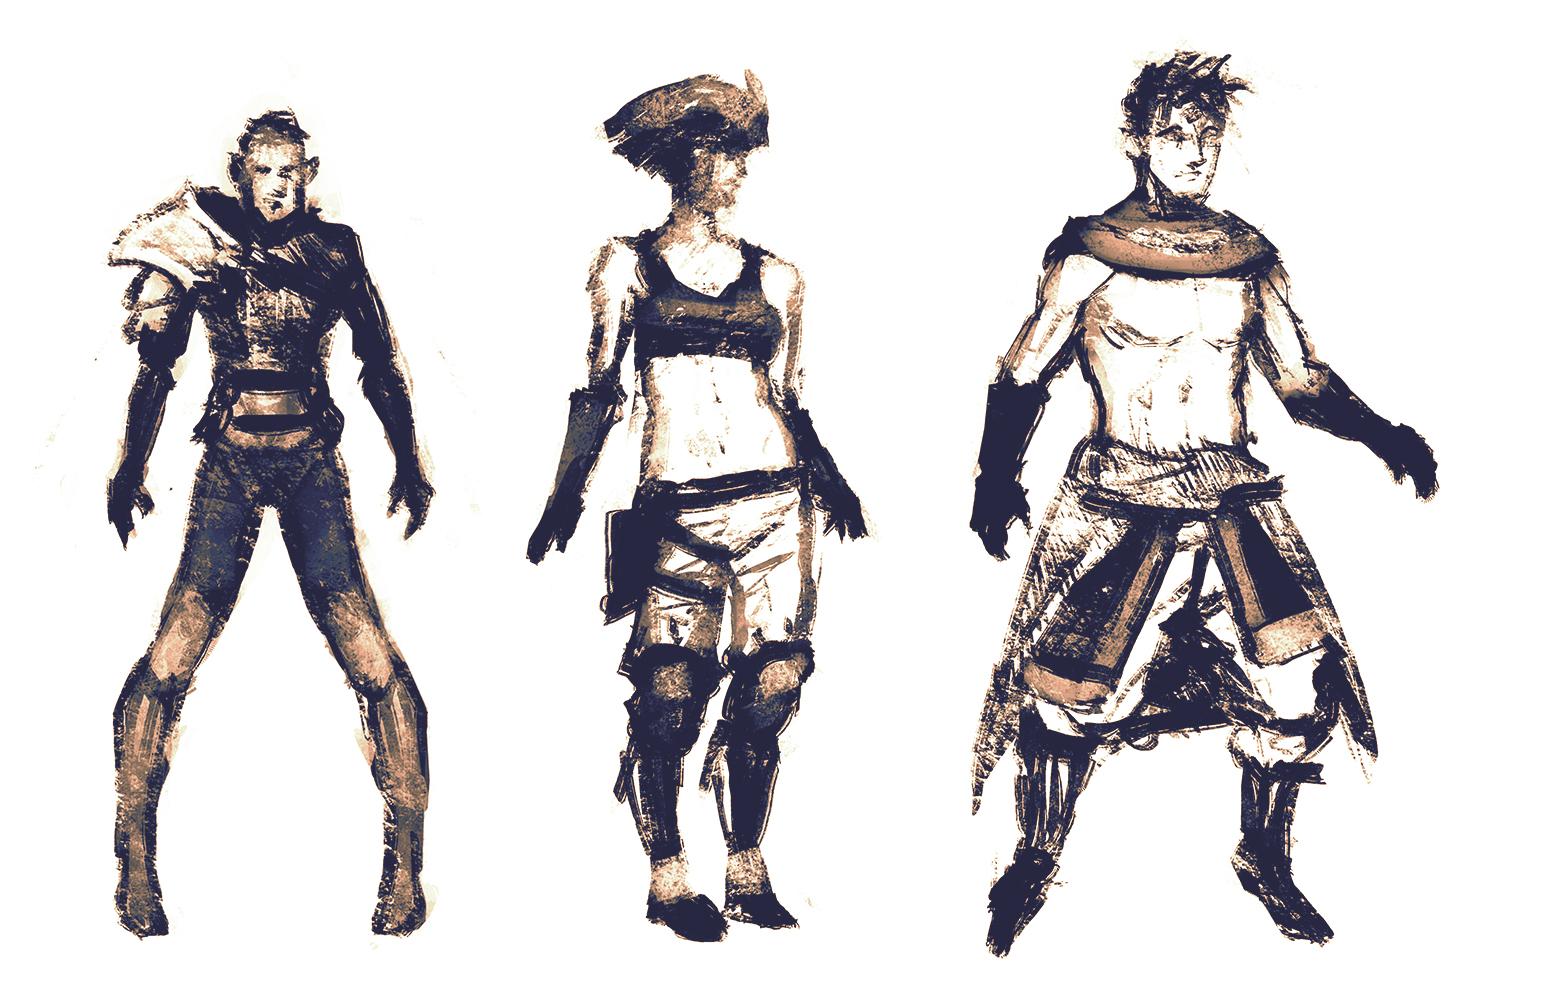 Character-SketchThumbs-180224.jpg